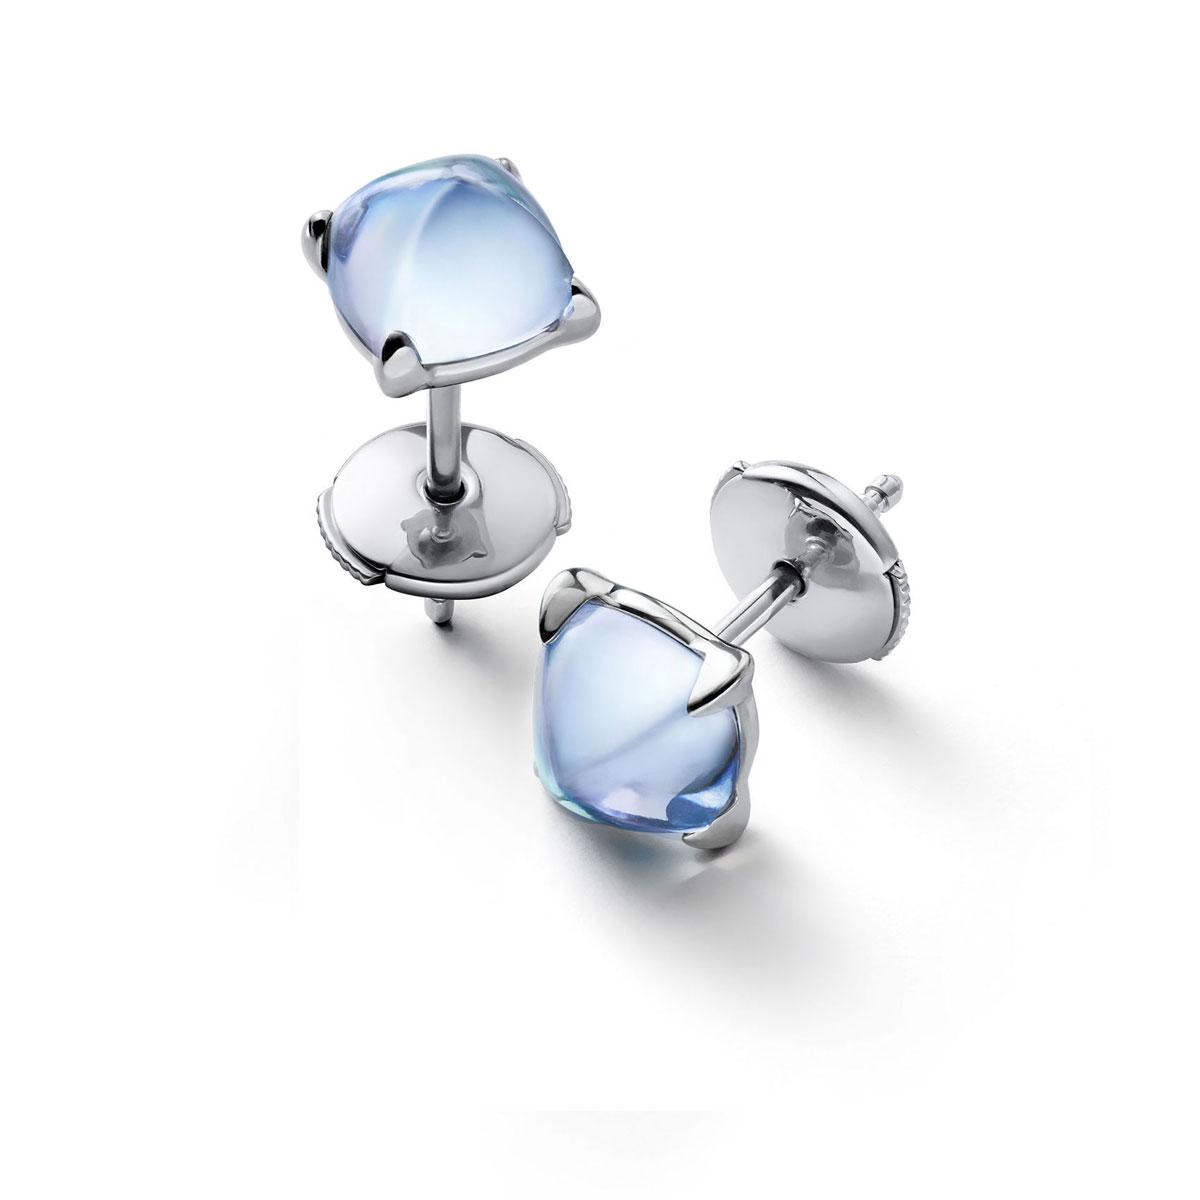 Baccarat Crystal Medicis Mini Stud Earrings Sterling Silver Aqua Mirror